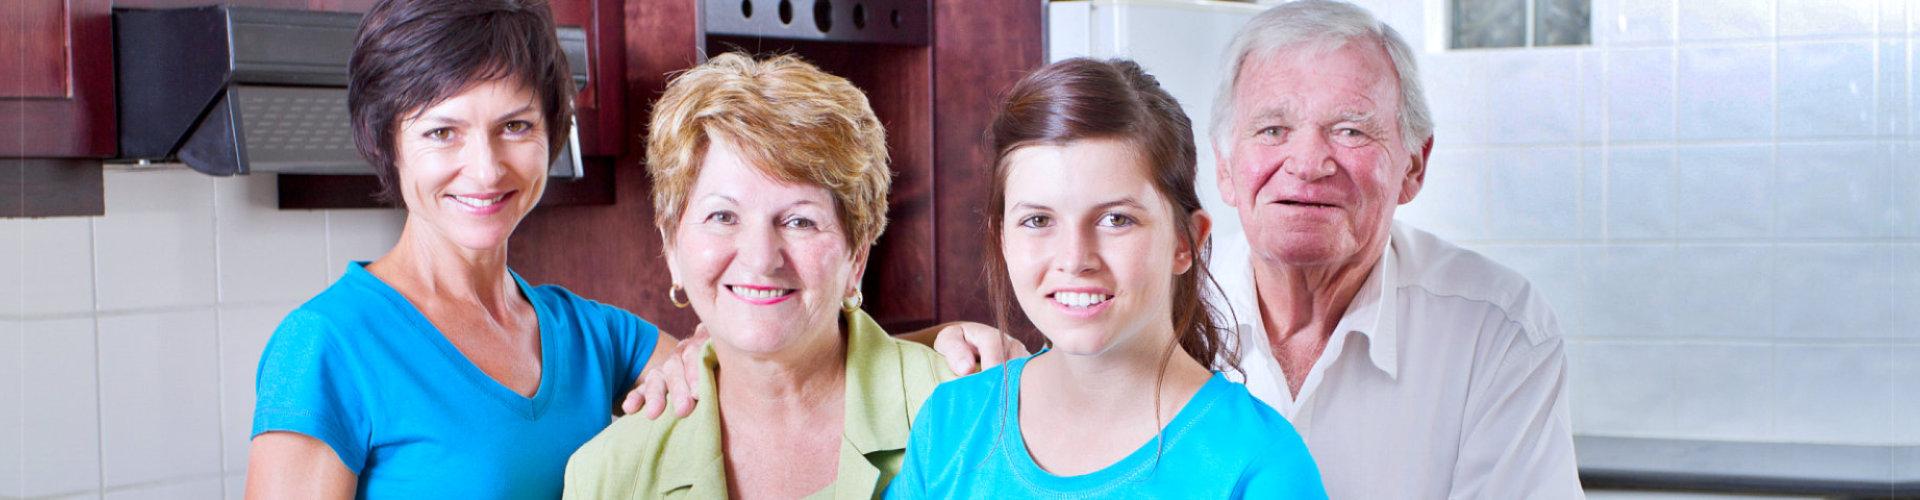 3 generation family portrait in kitchen